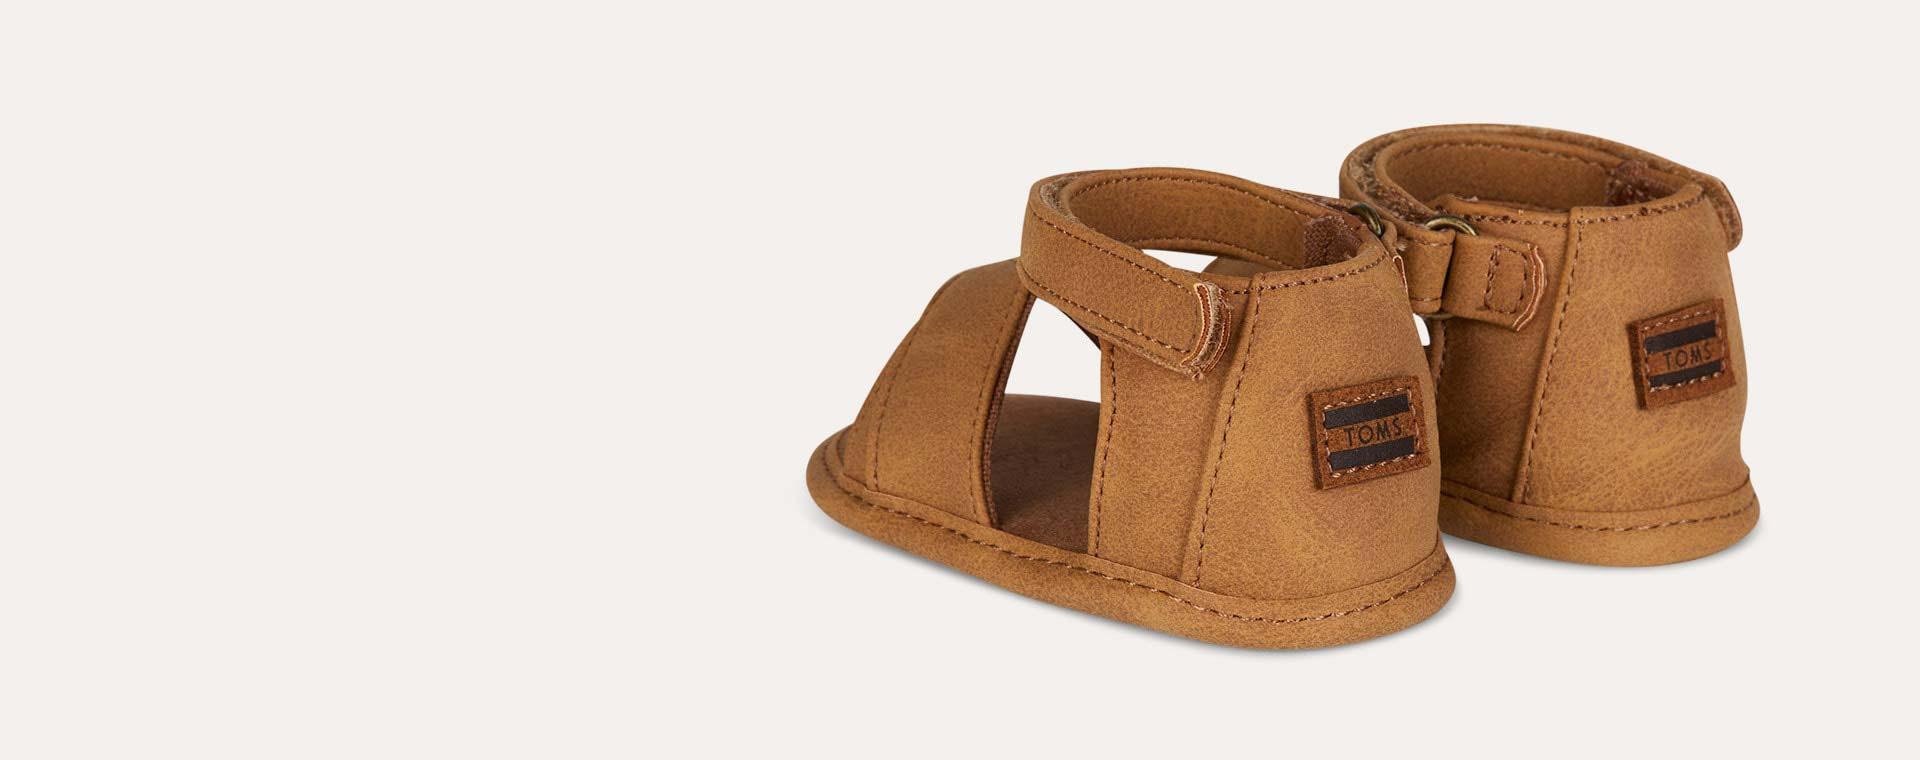 Toffee TOMS Shiloh Crib Sandal